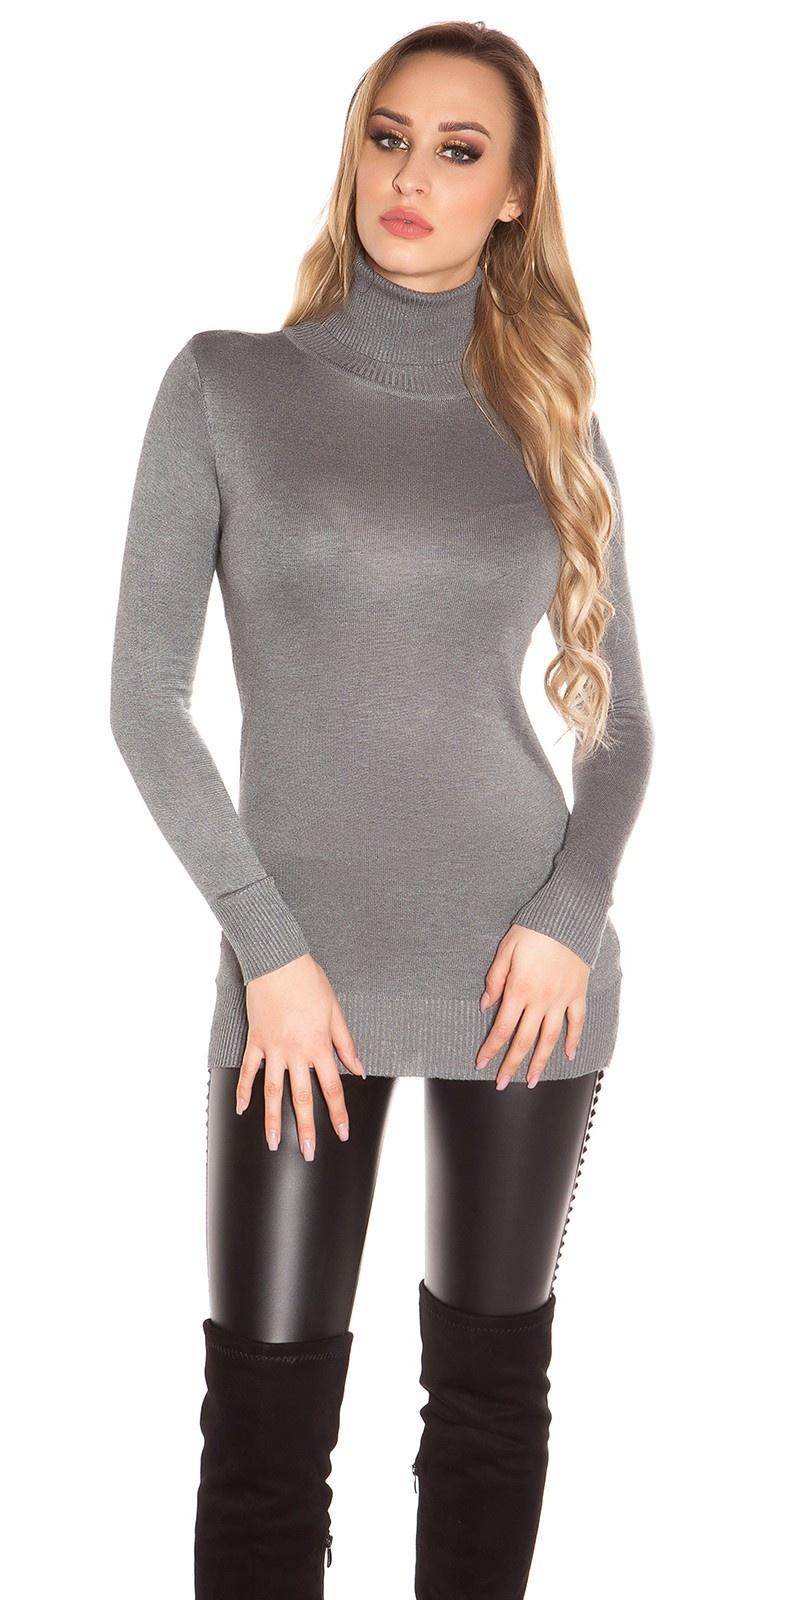 Sexy turtleneck longsweater Grey